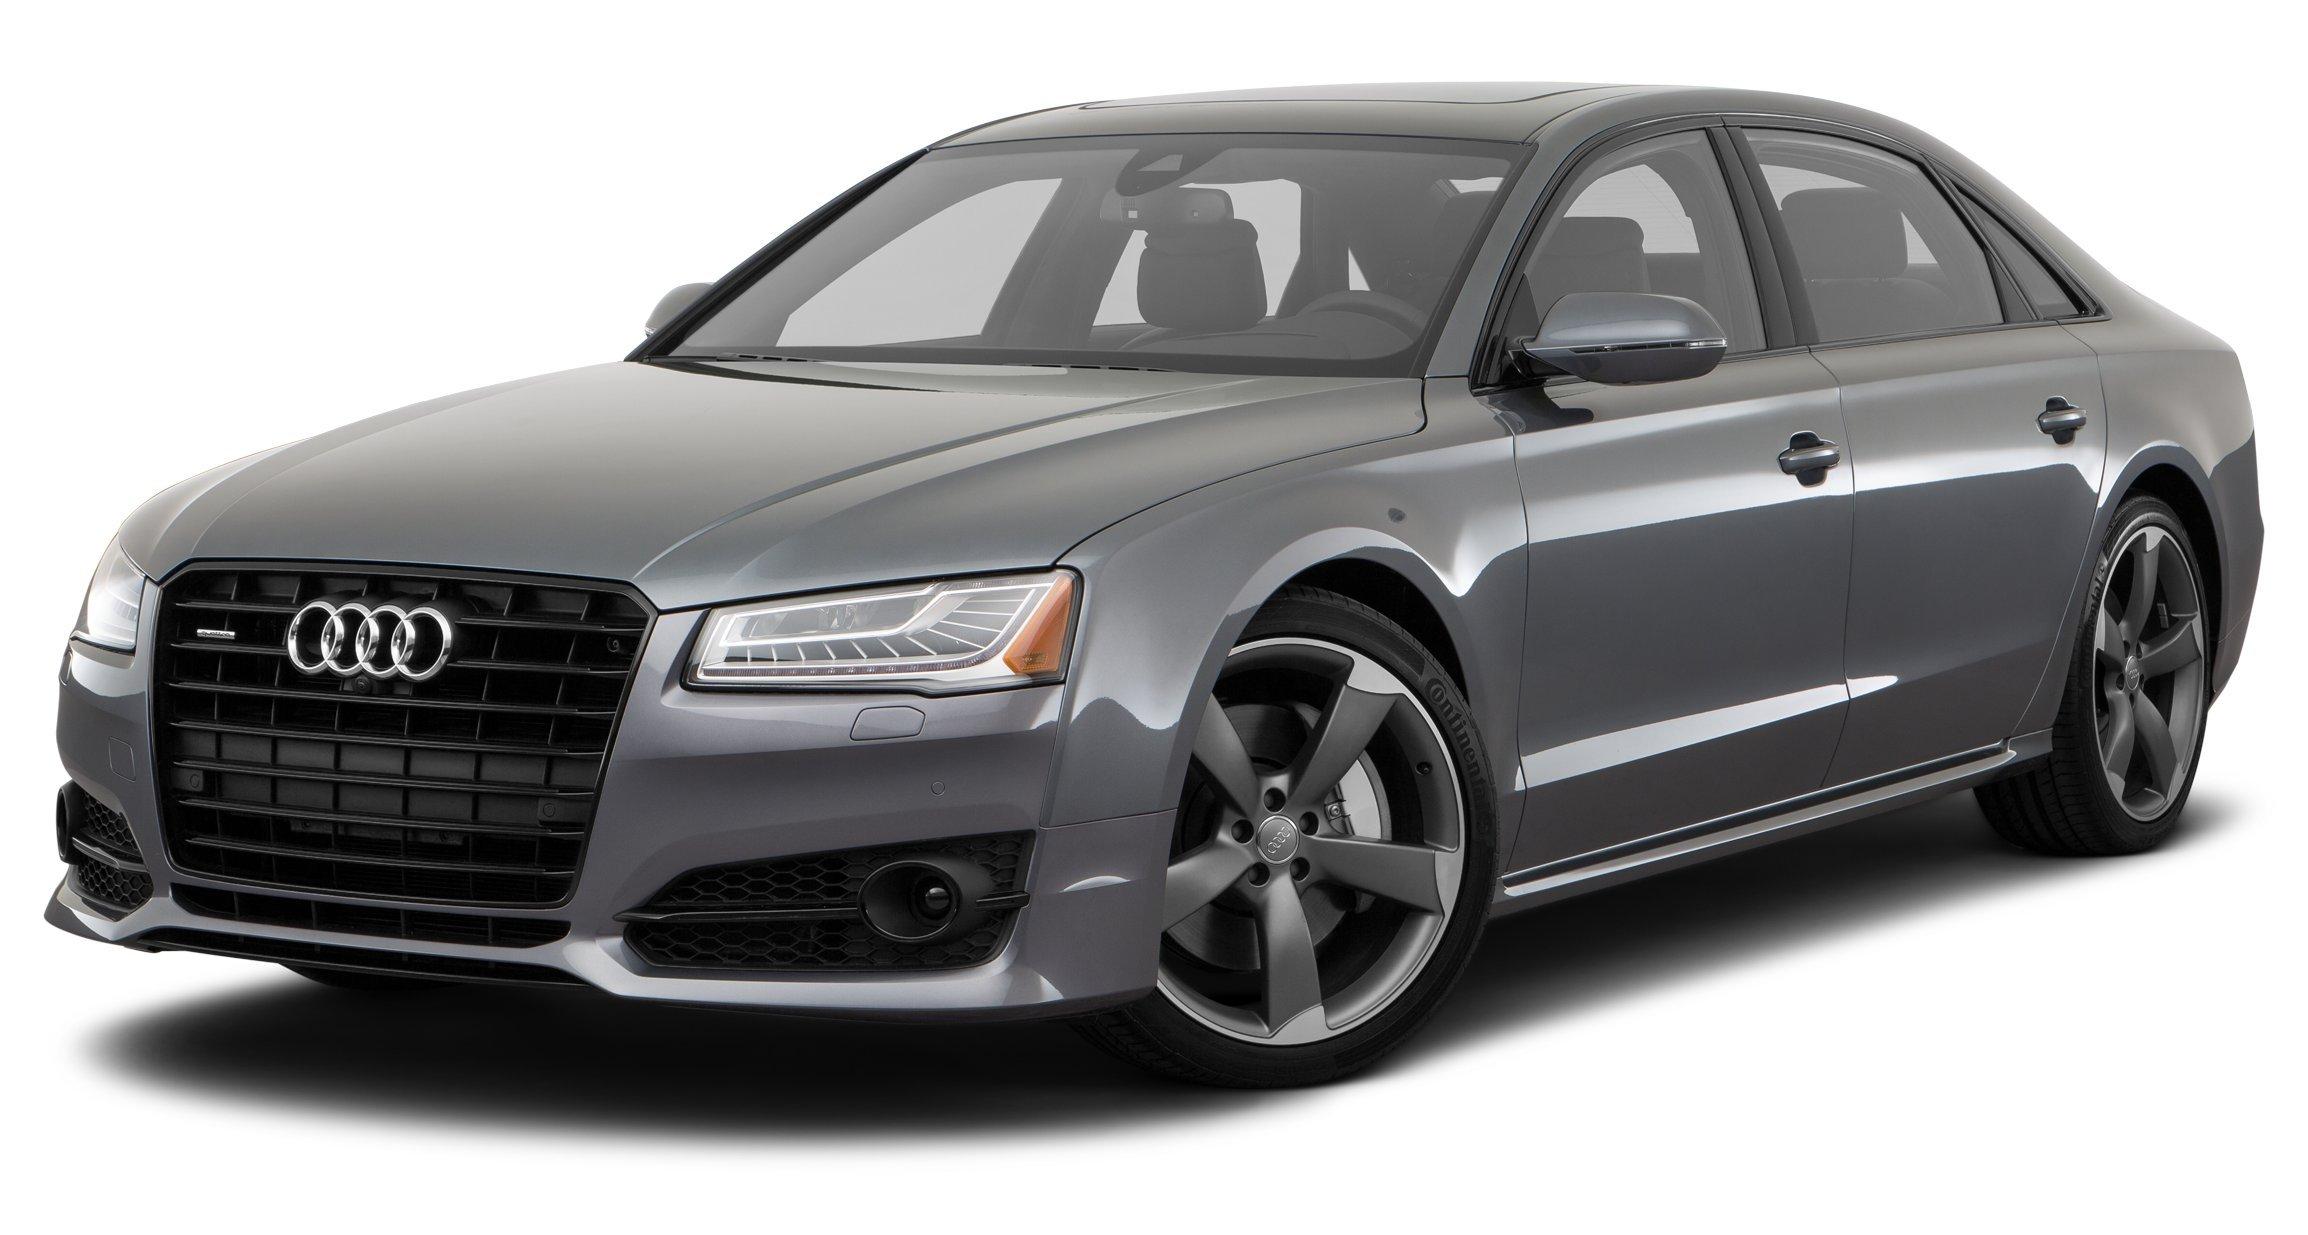 Amazon Com 2017 Audi A8 Quattro Reviews Images And Specs Vehicles 2017 audi a8 3 tdi quattro 4k